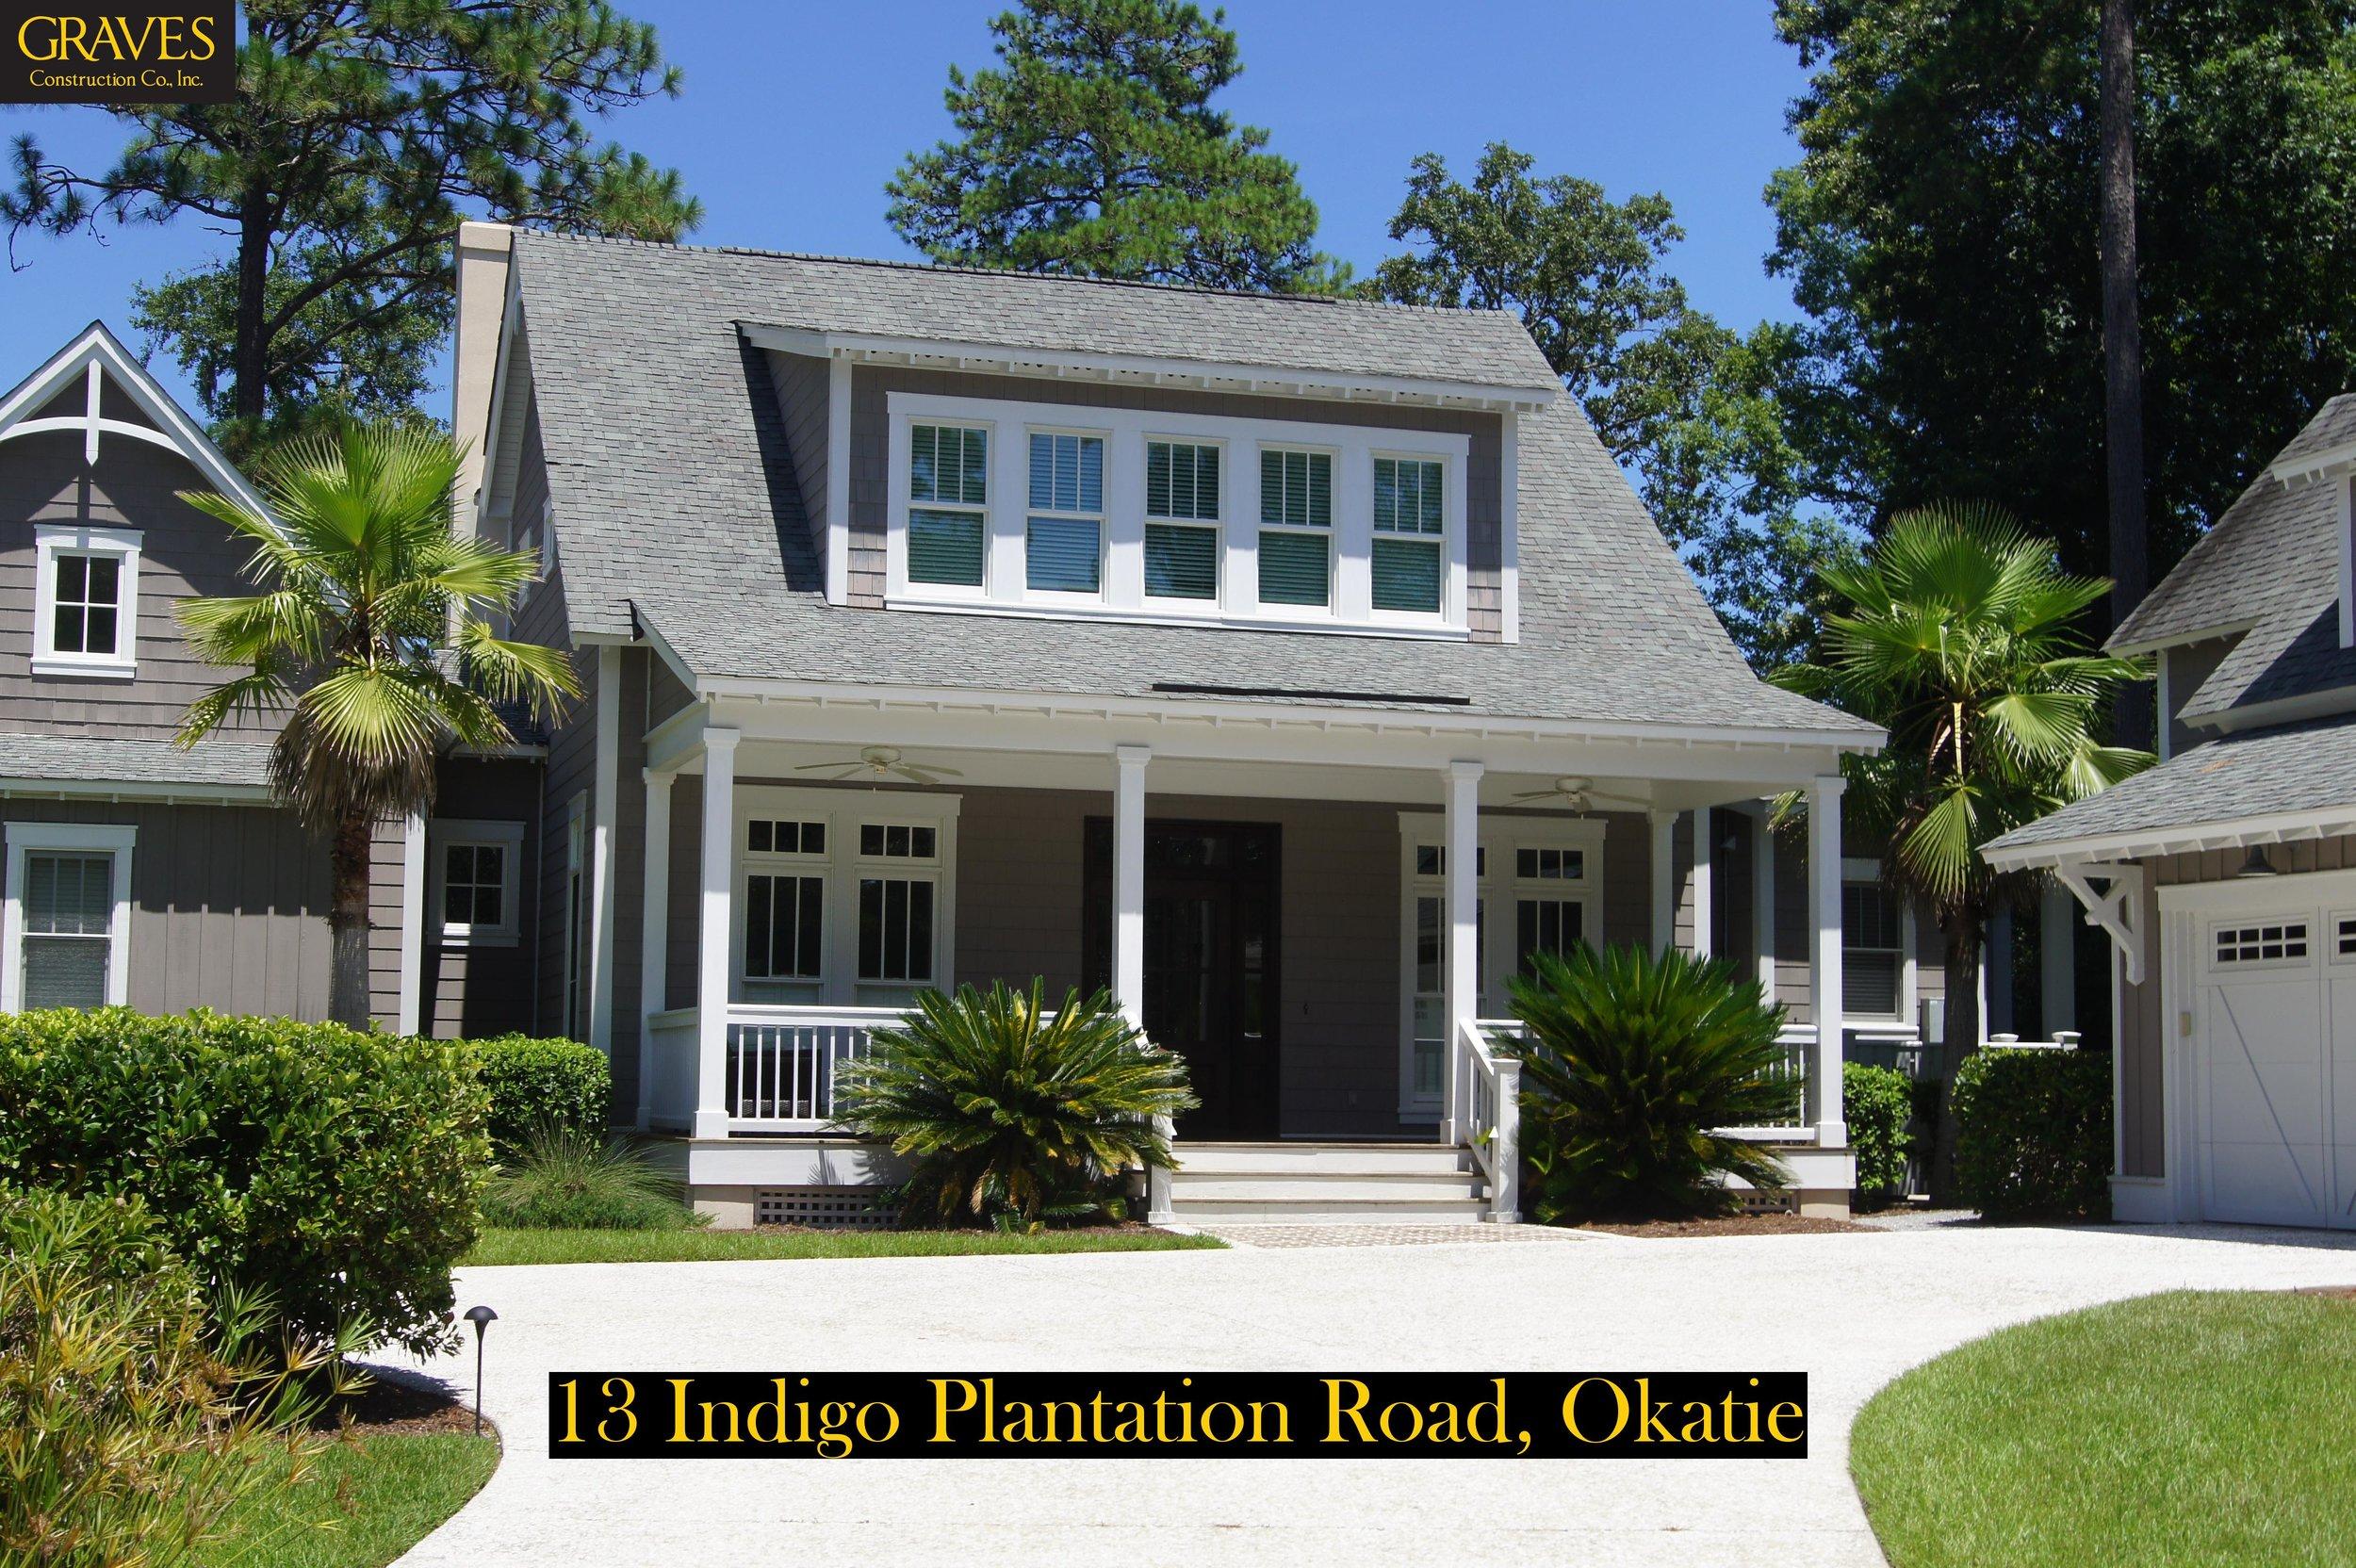 13 Indigo Plantation Rd - 3